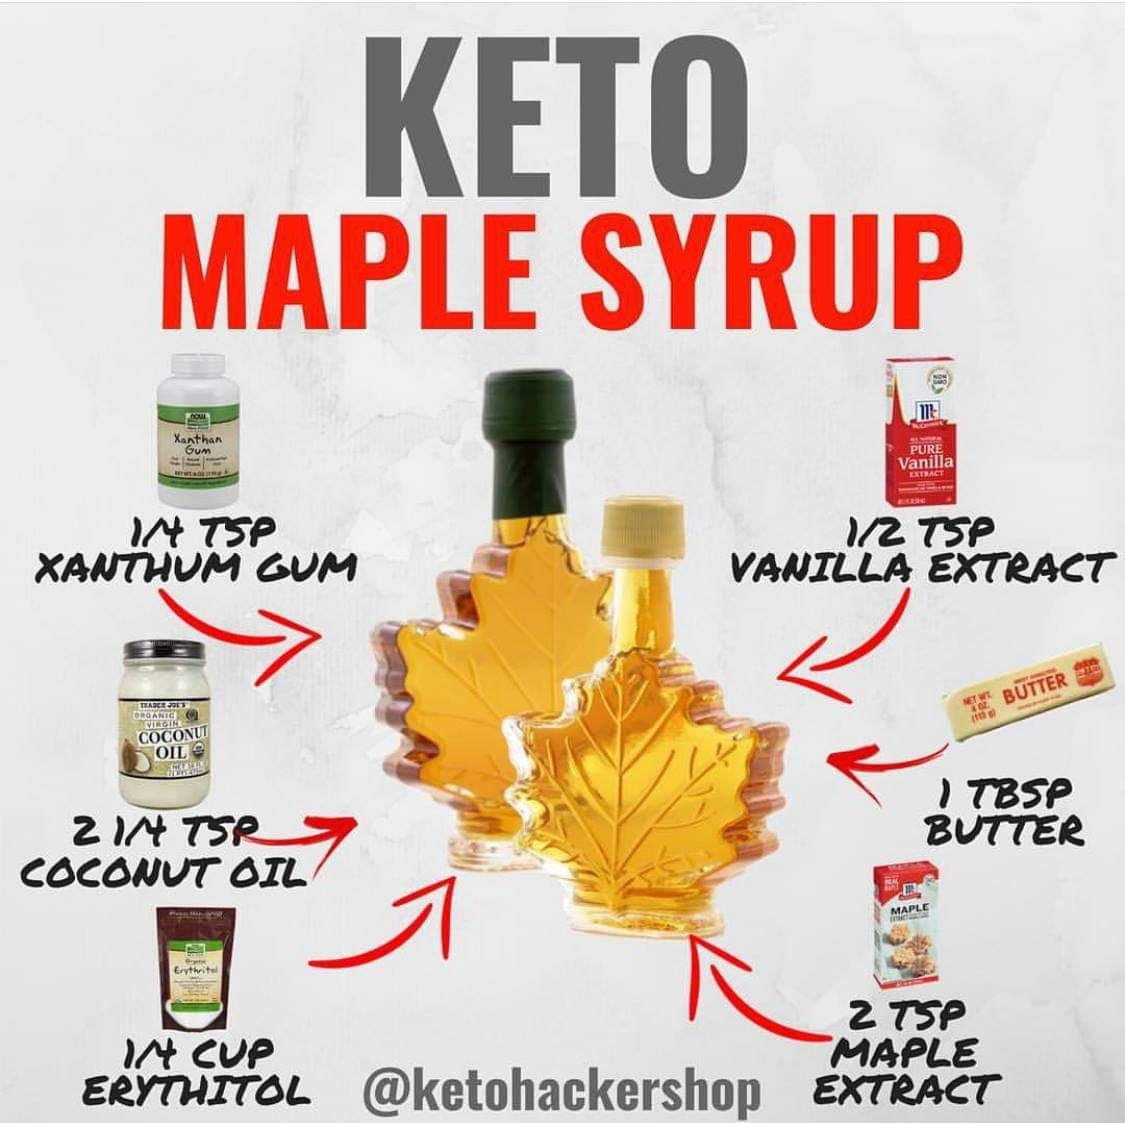 Keto maple syrup keto recipe keto dessert and sweets